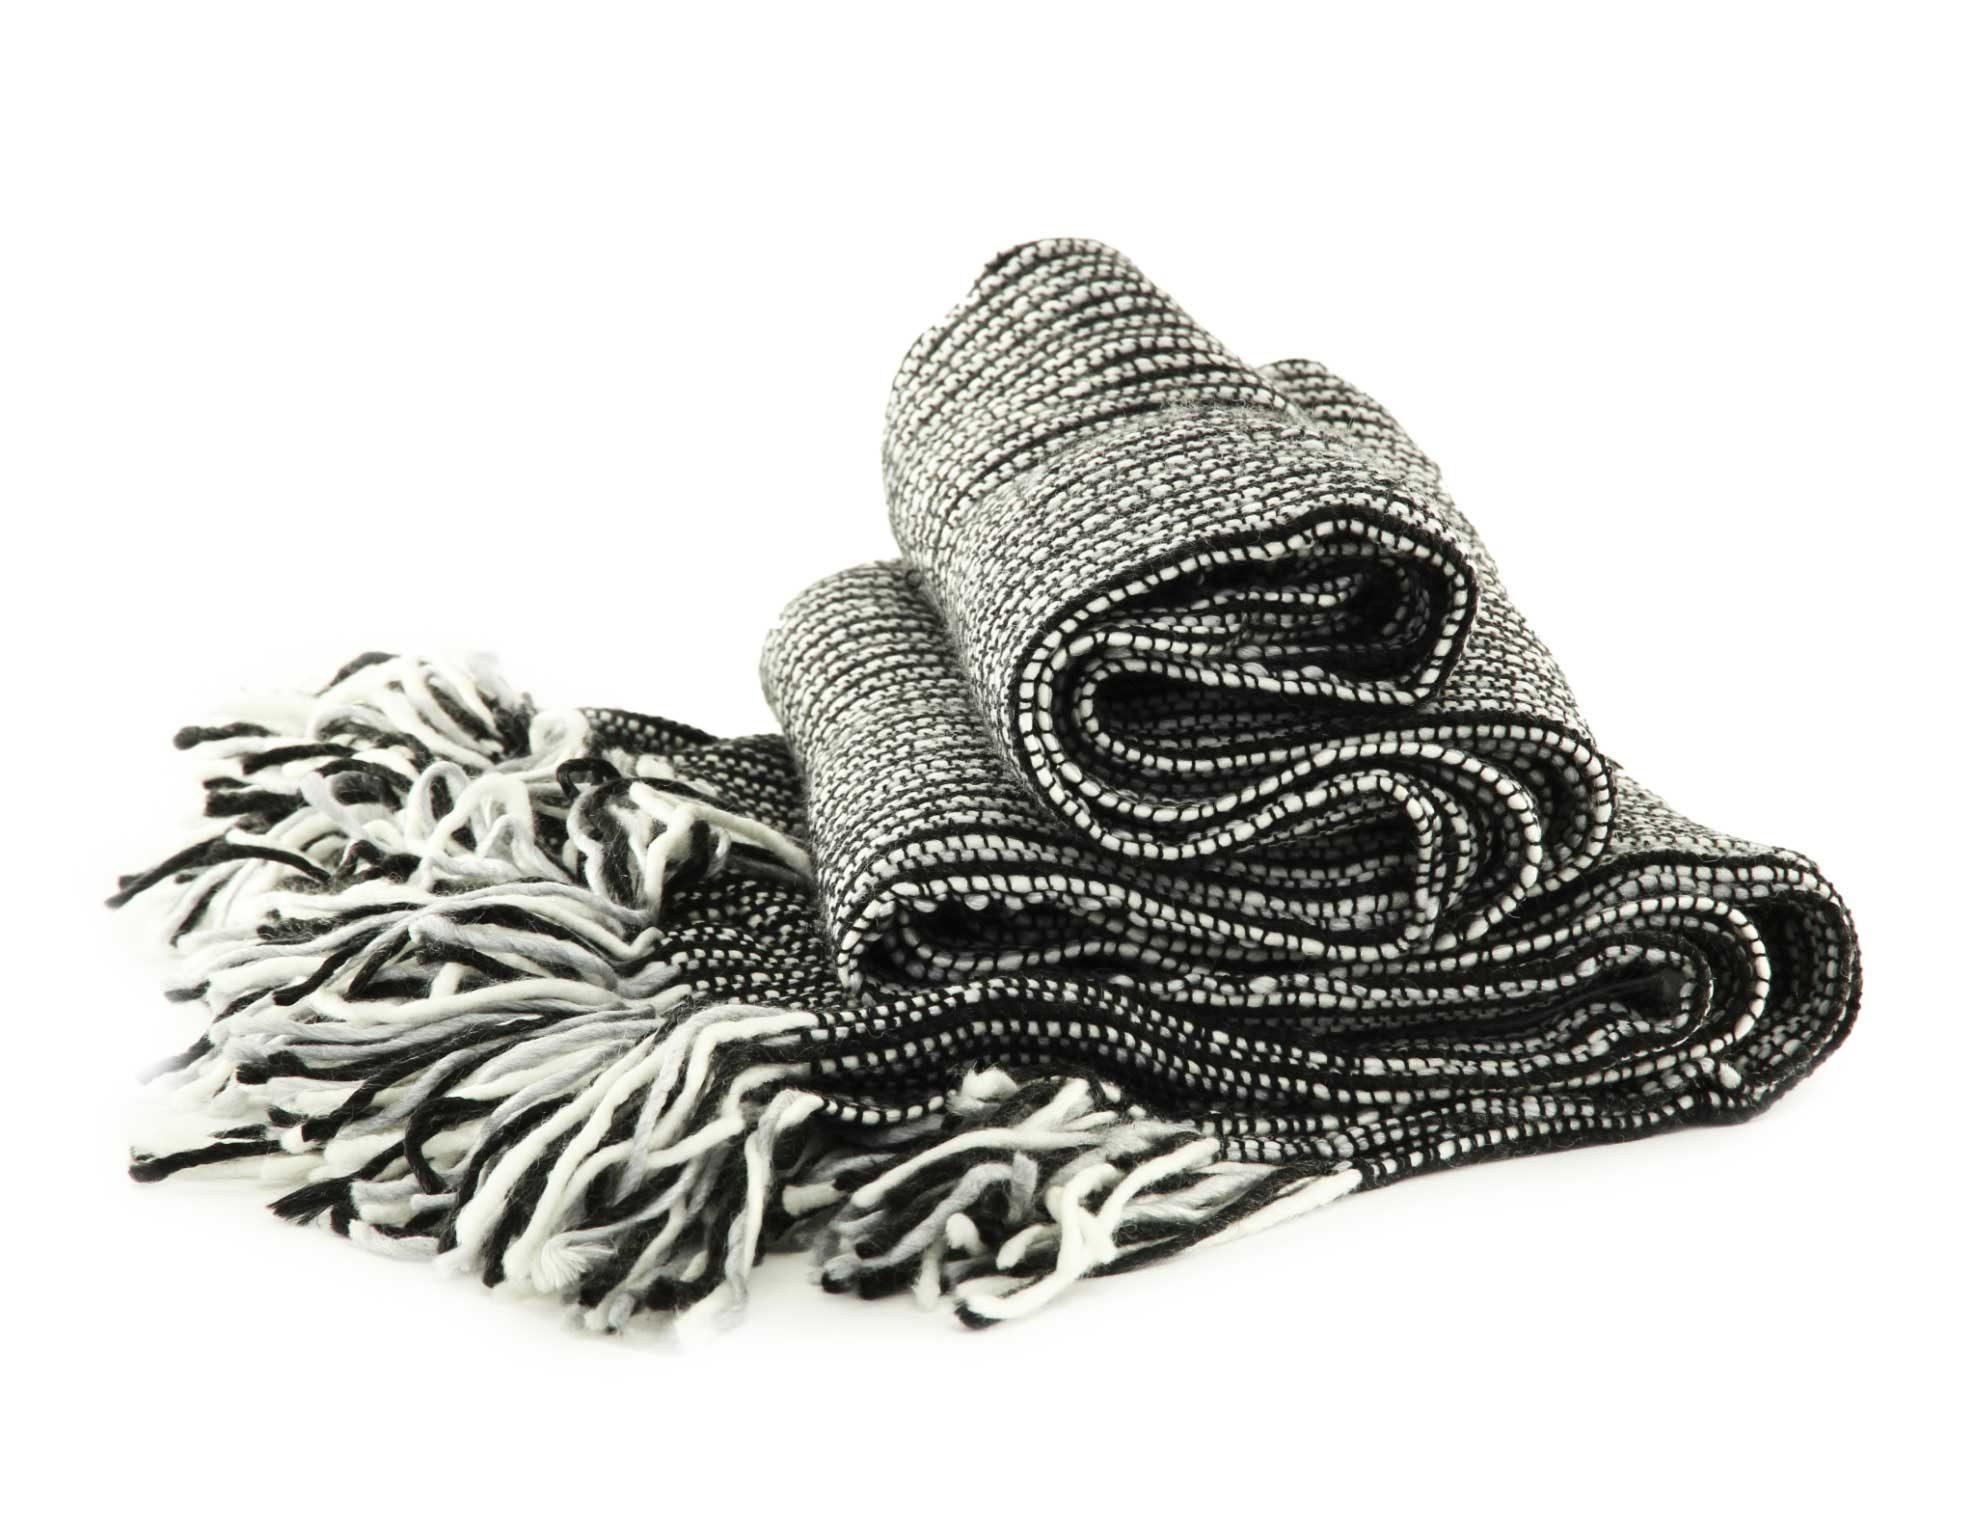 A Warm Blanket